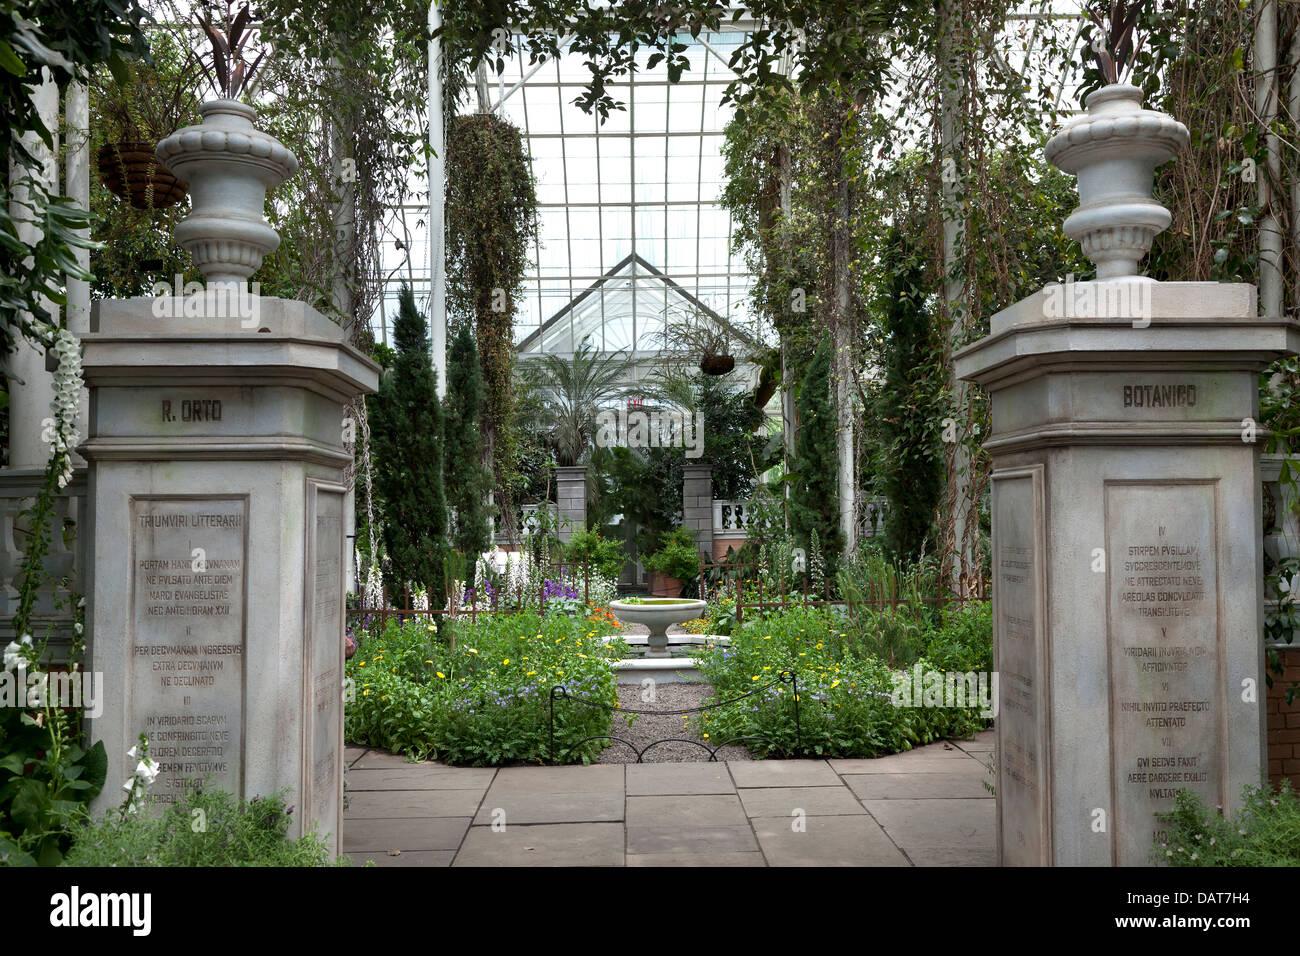 Botanical Garden in the Bronx, New York City - Stock Image